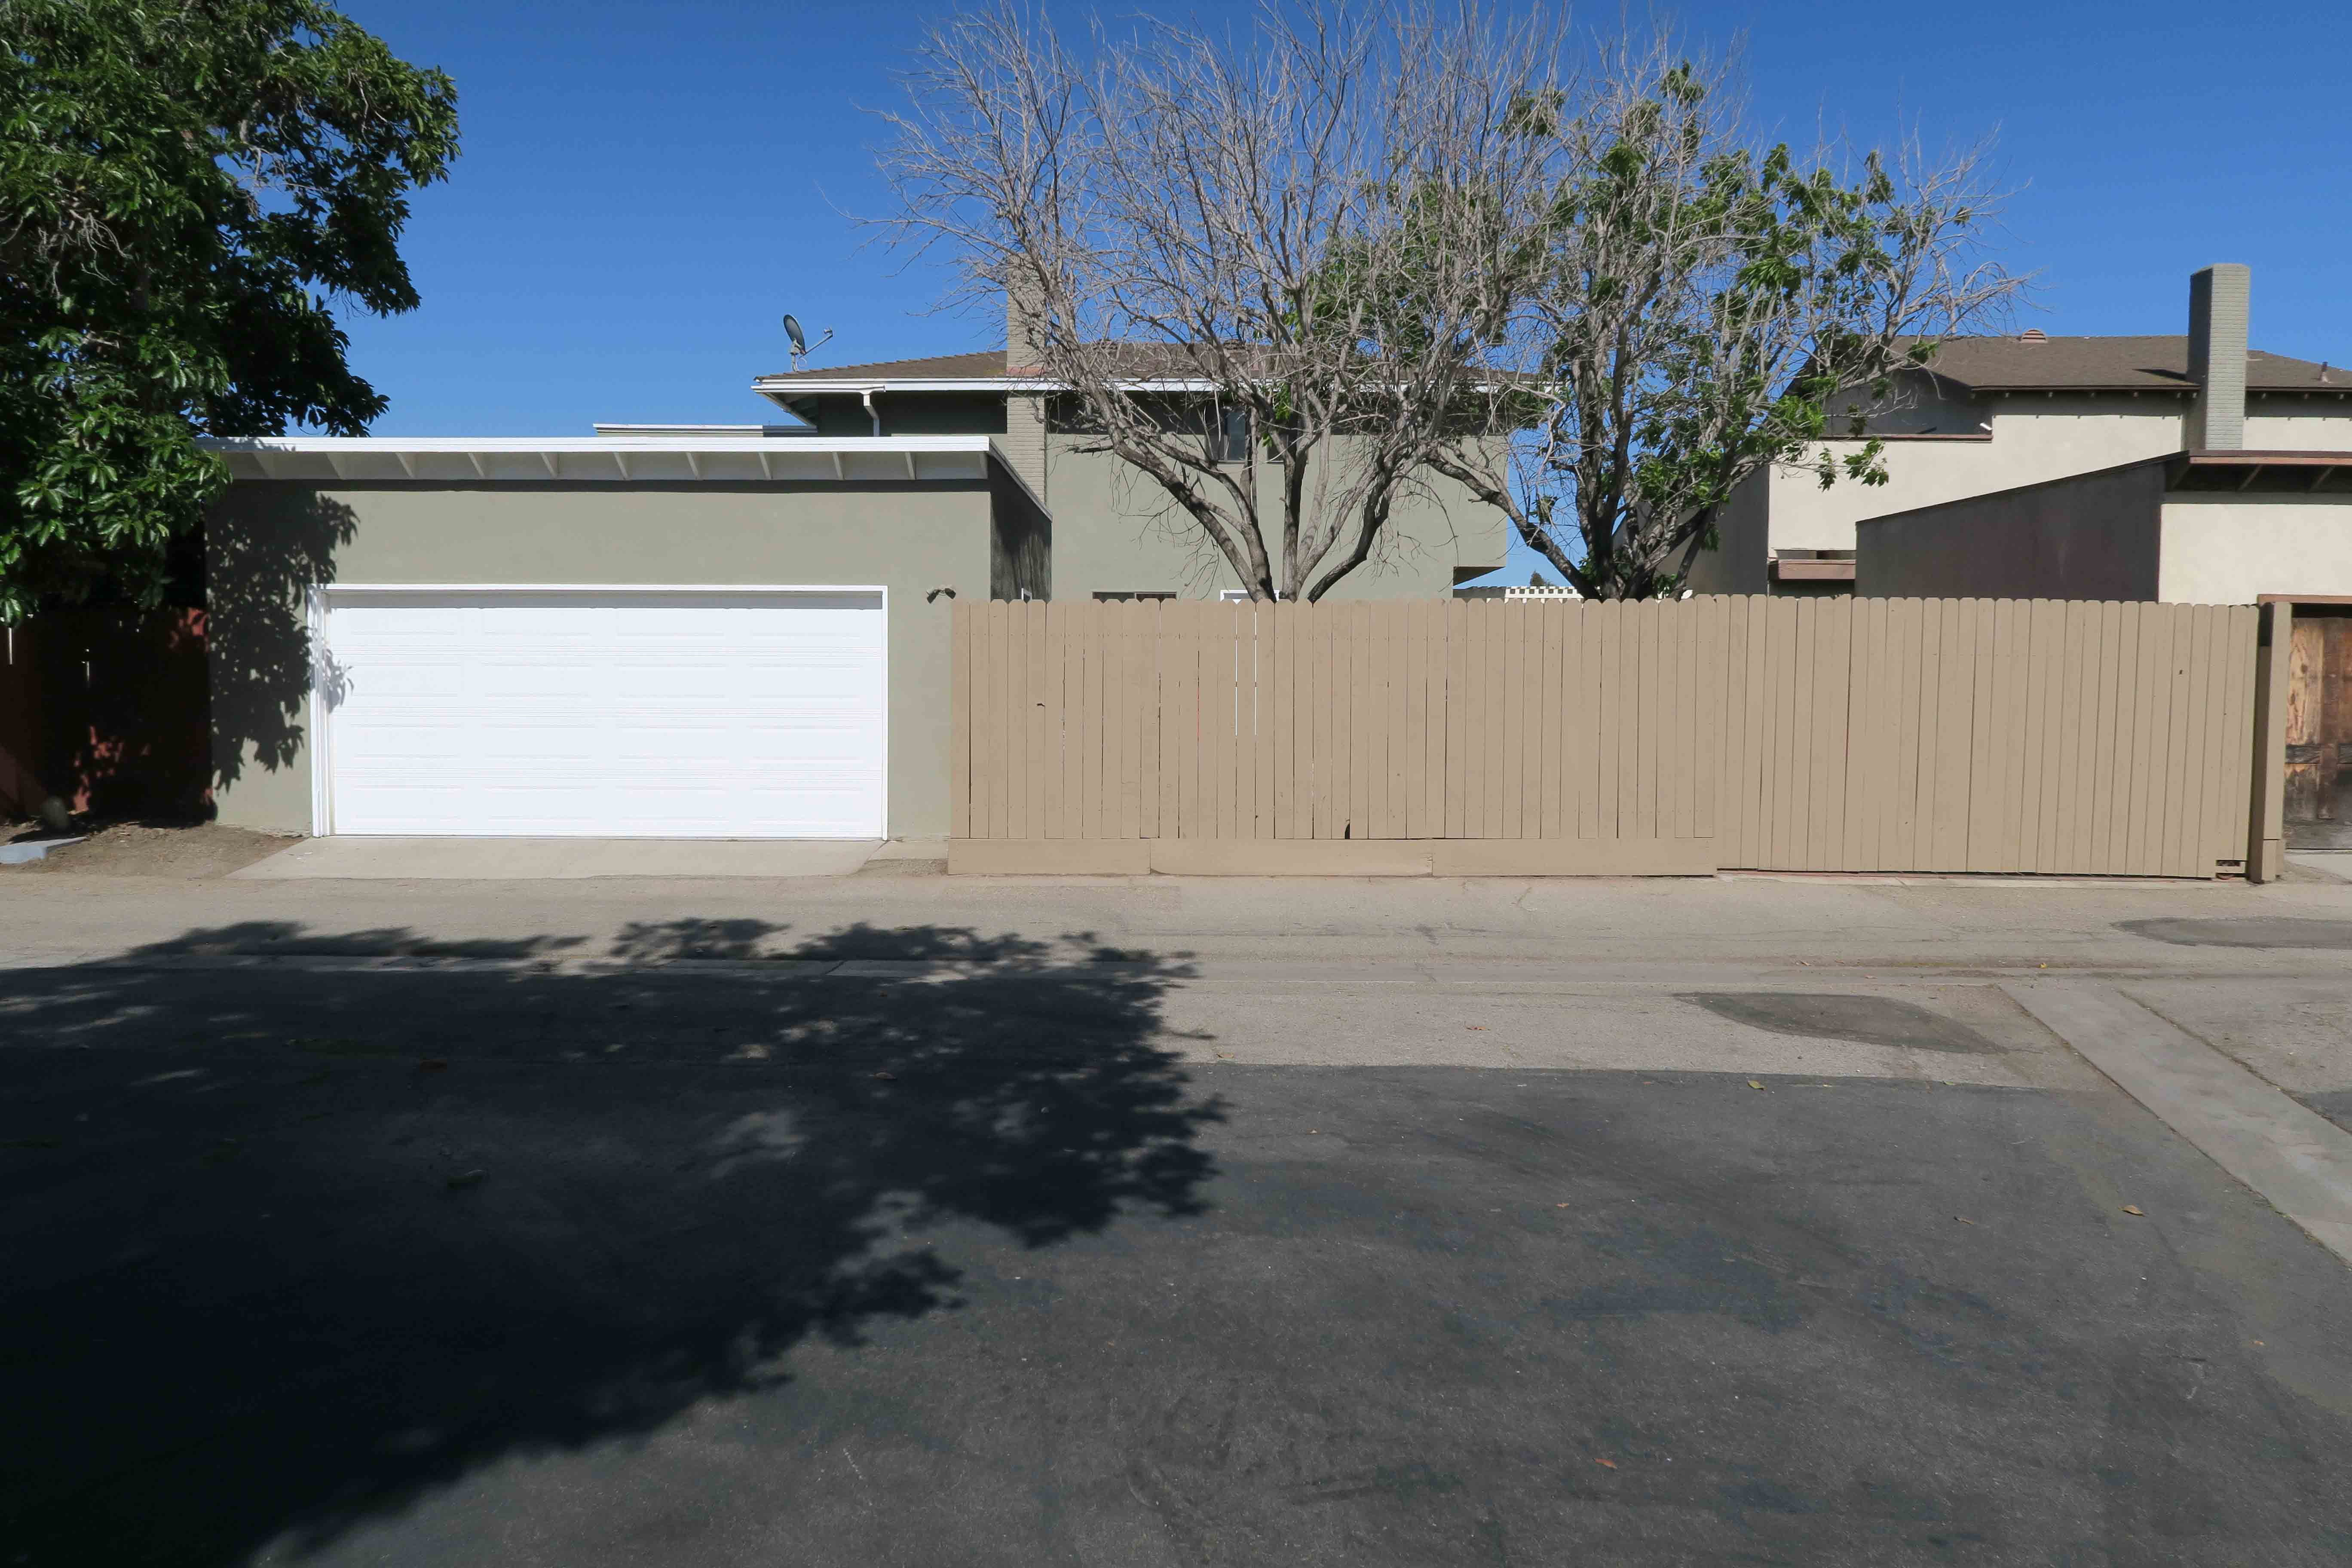 1841 Adelaide Ct, Oxnard CA 93035 Garage View